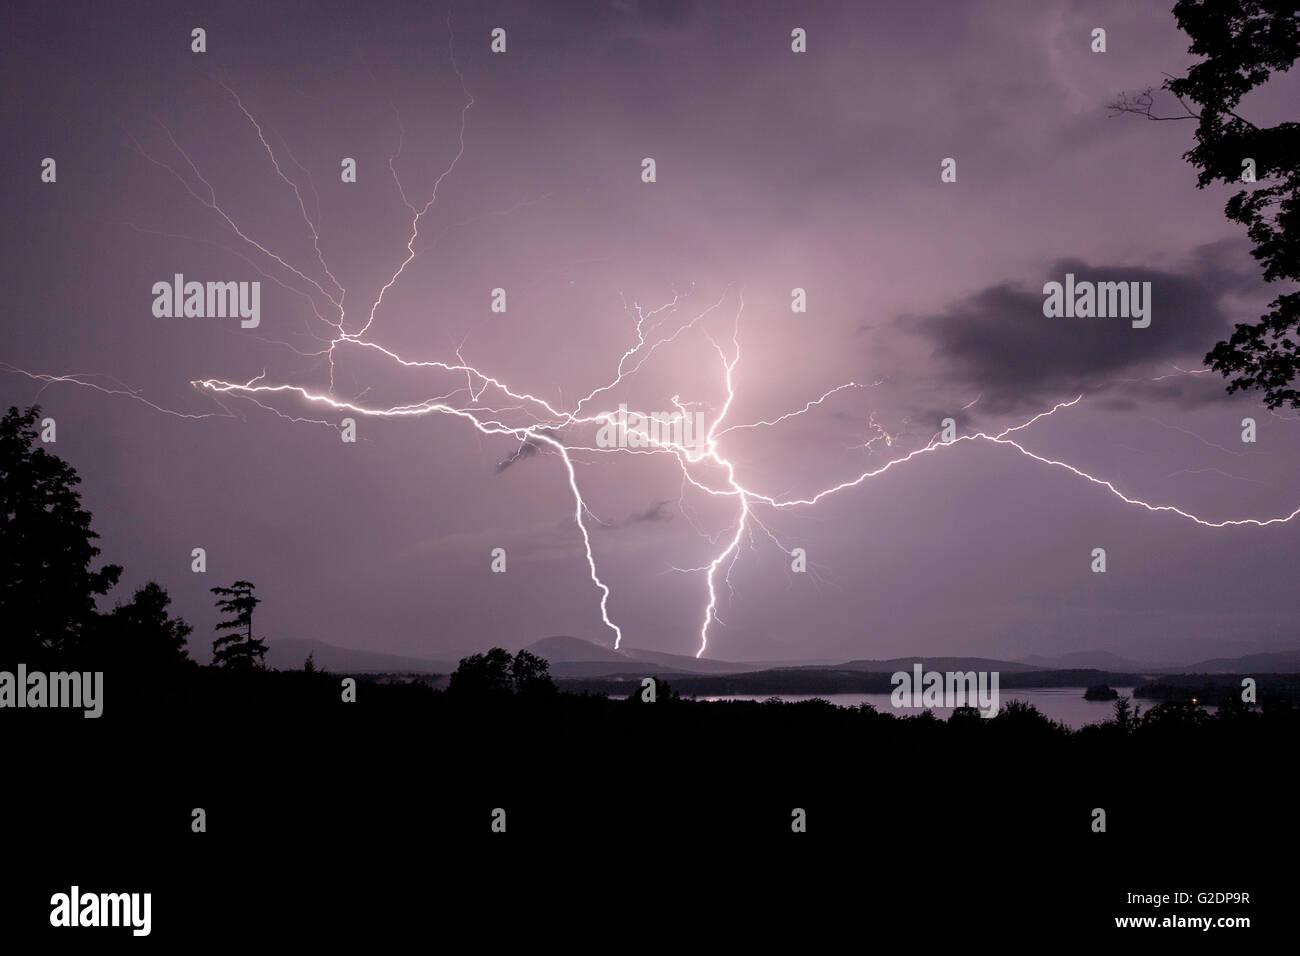 Lightening strike over Sacandaga Lake, Adirondack Mountains, Lake Pleasant, New York, United States - Stock Image